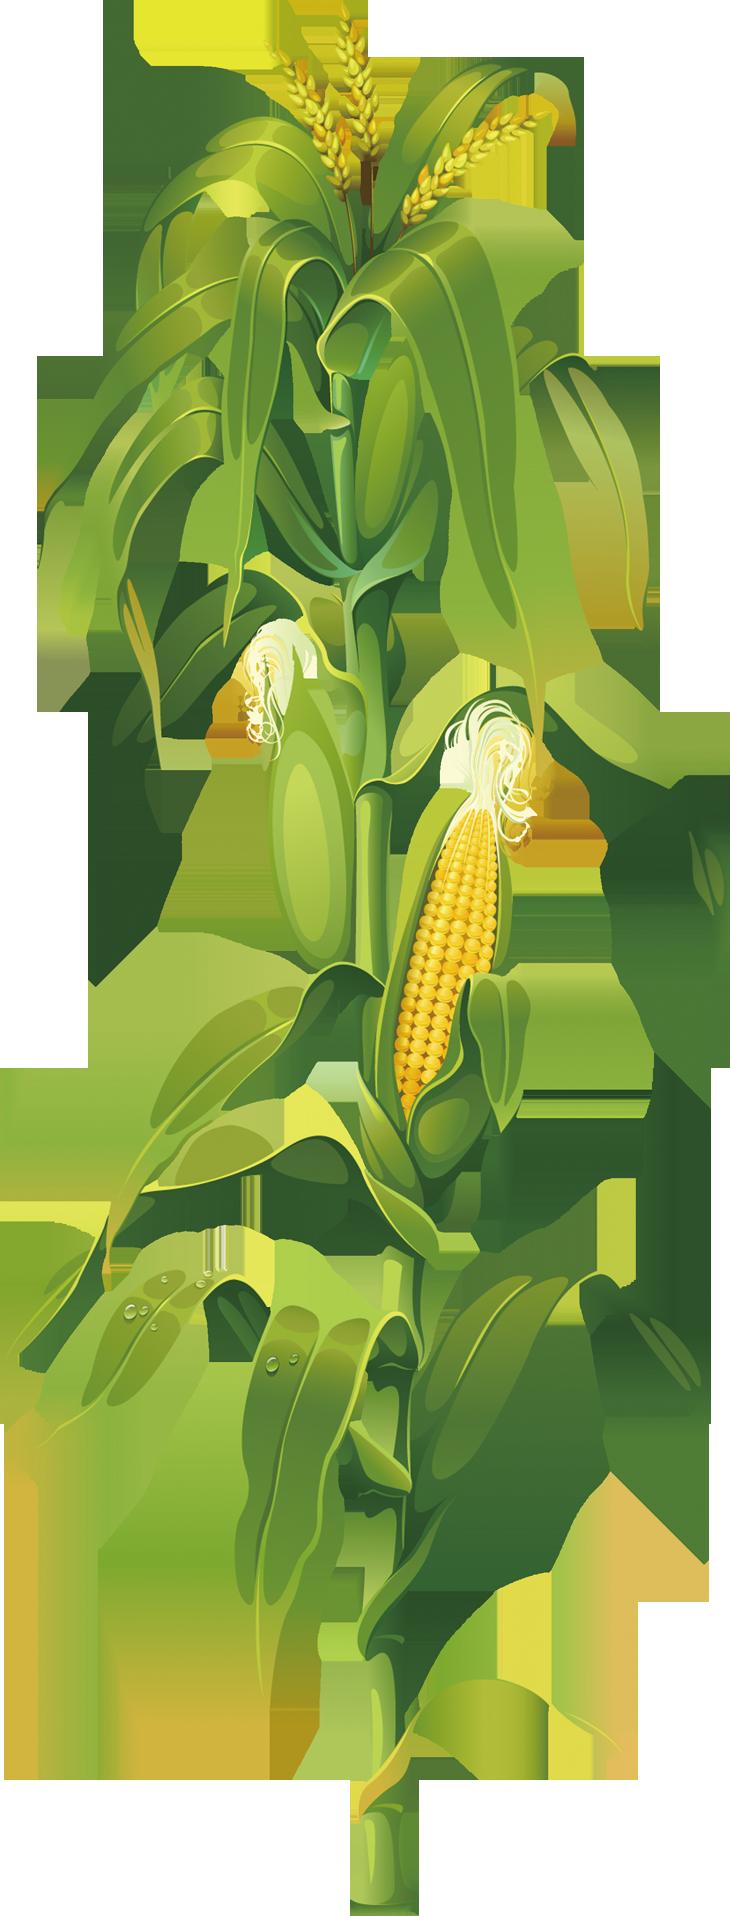 Https W7 Pngwing Com Path 619 784 867 Maize Corn On The Cob Drawing Plant Clip Art Corn E4b50ed950123c495502d3b9d1213b37 Png Di 2020 Tanaman Daun Gambar